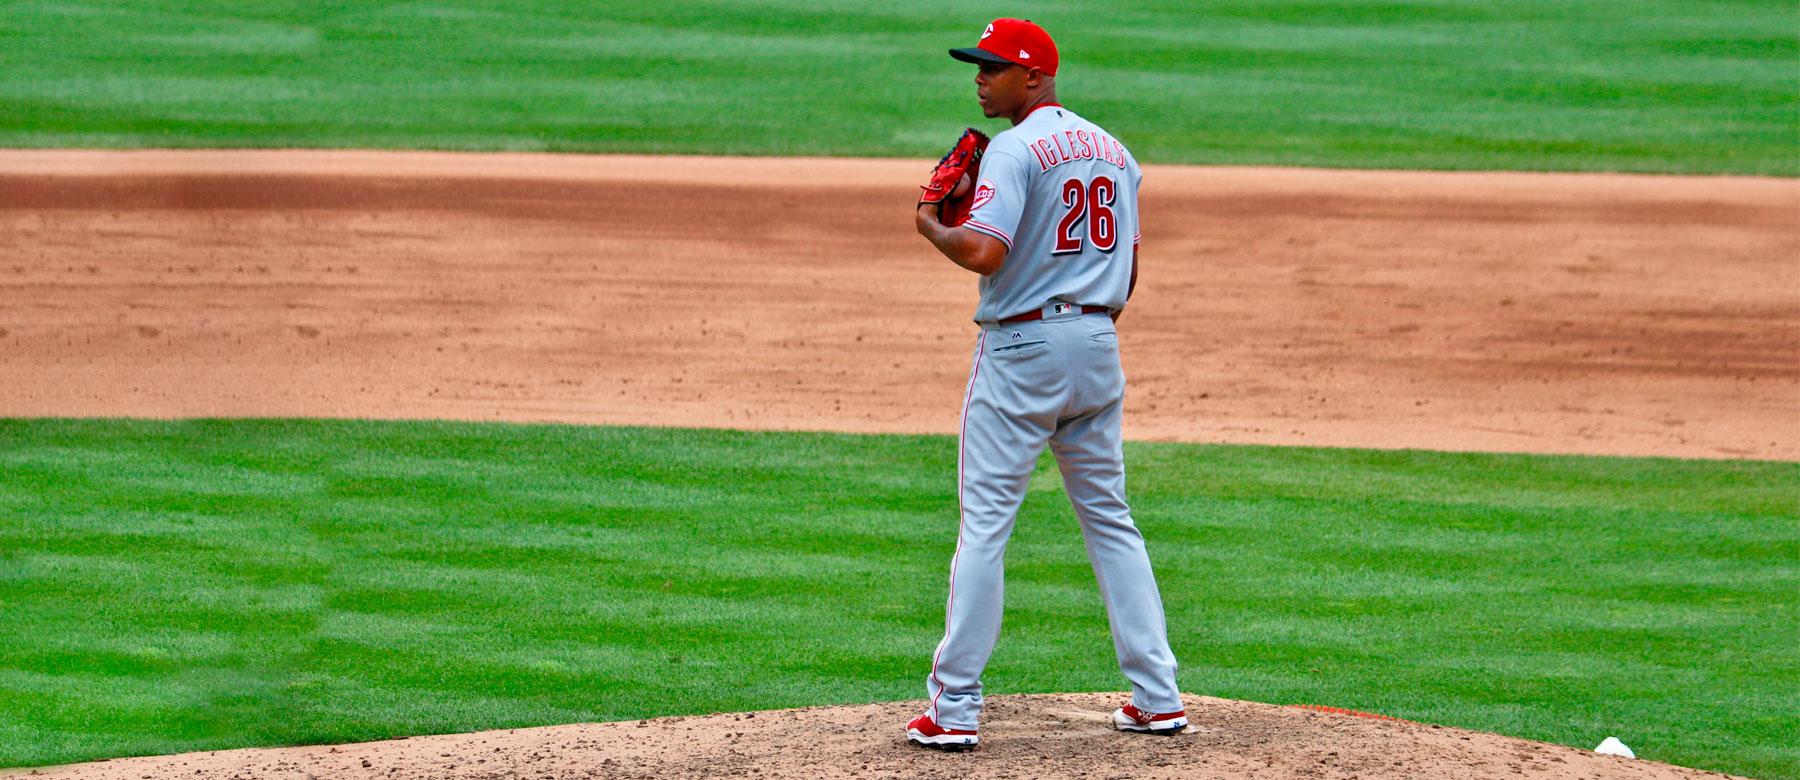 Aristedes Aquino Louisville Bats Baseball Trading Card Cincinnati Reds Rare 2019